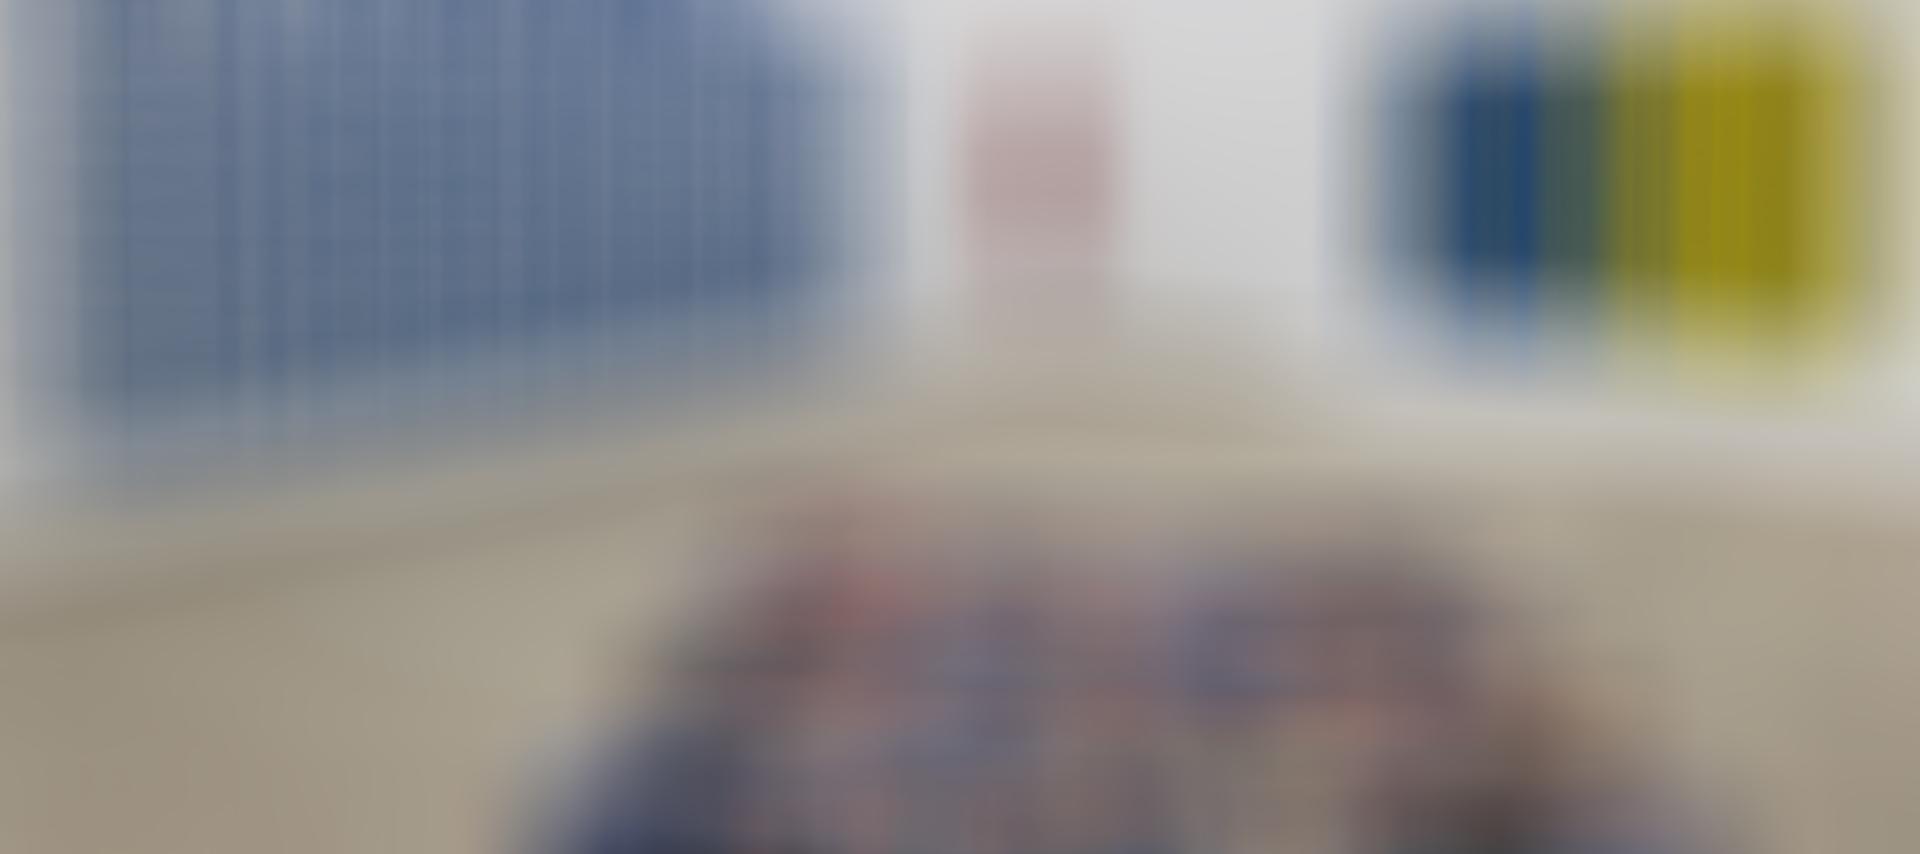 Rasheed Araeen: A Retrospective. Image: Jonty Wilde © 2018 BALTIC